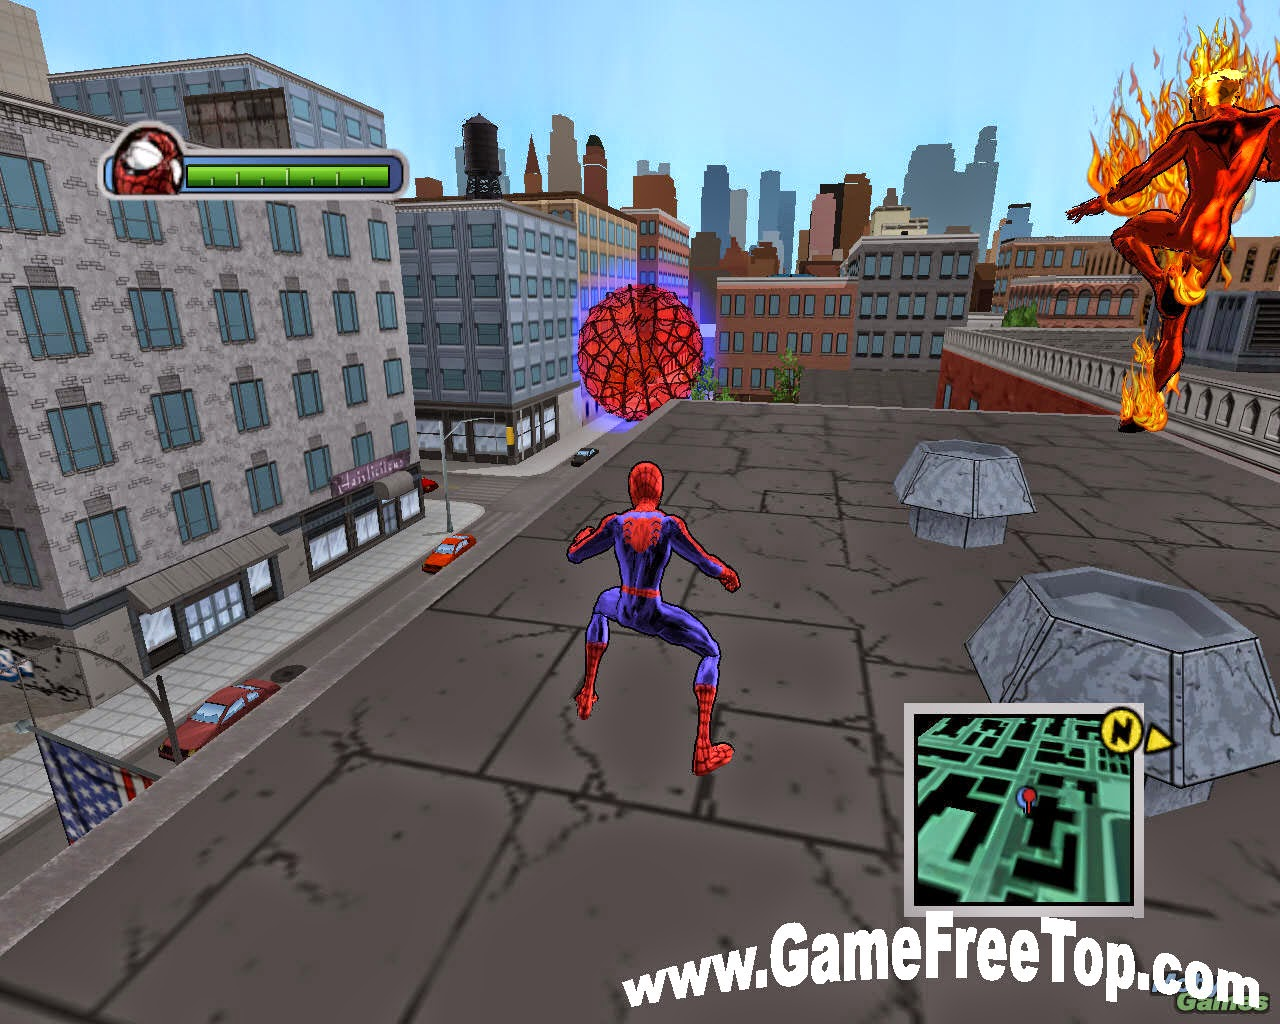 Ultimate SpiderMan - Full Version Game Download - PcGameFreeTop